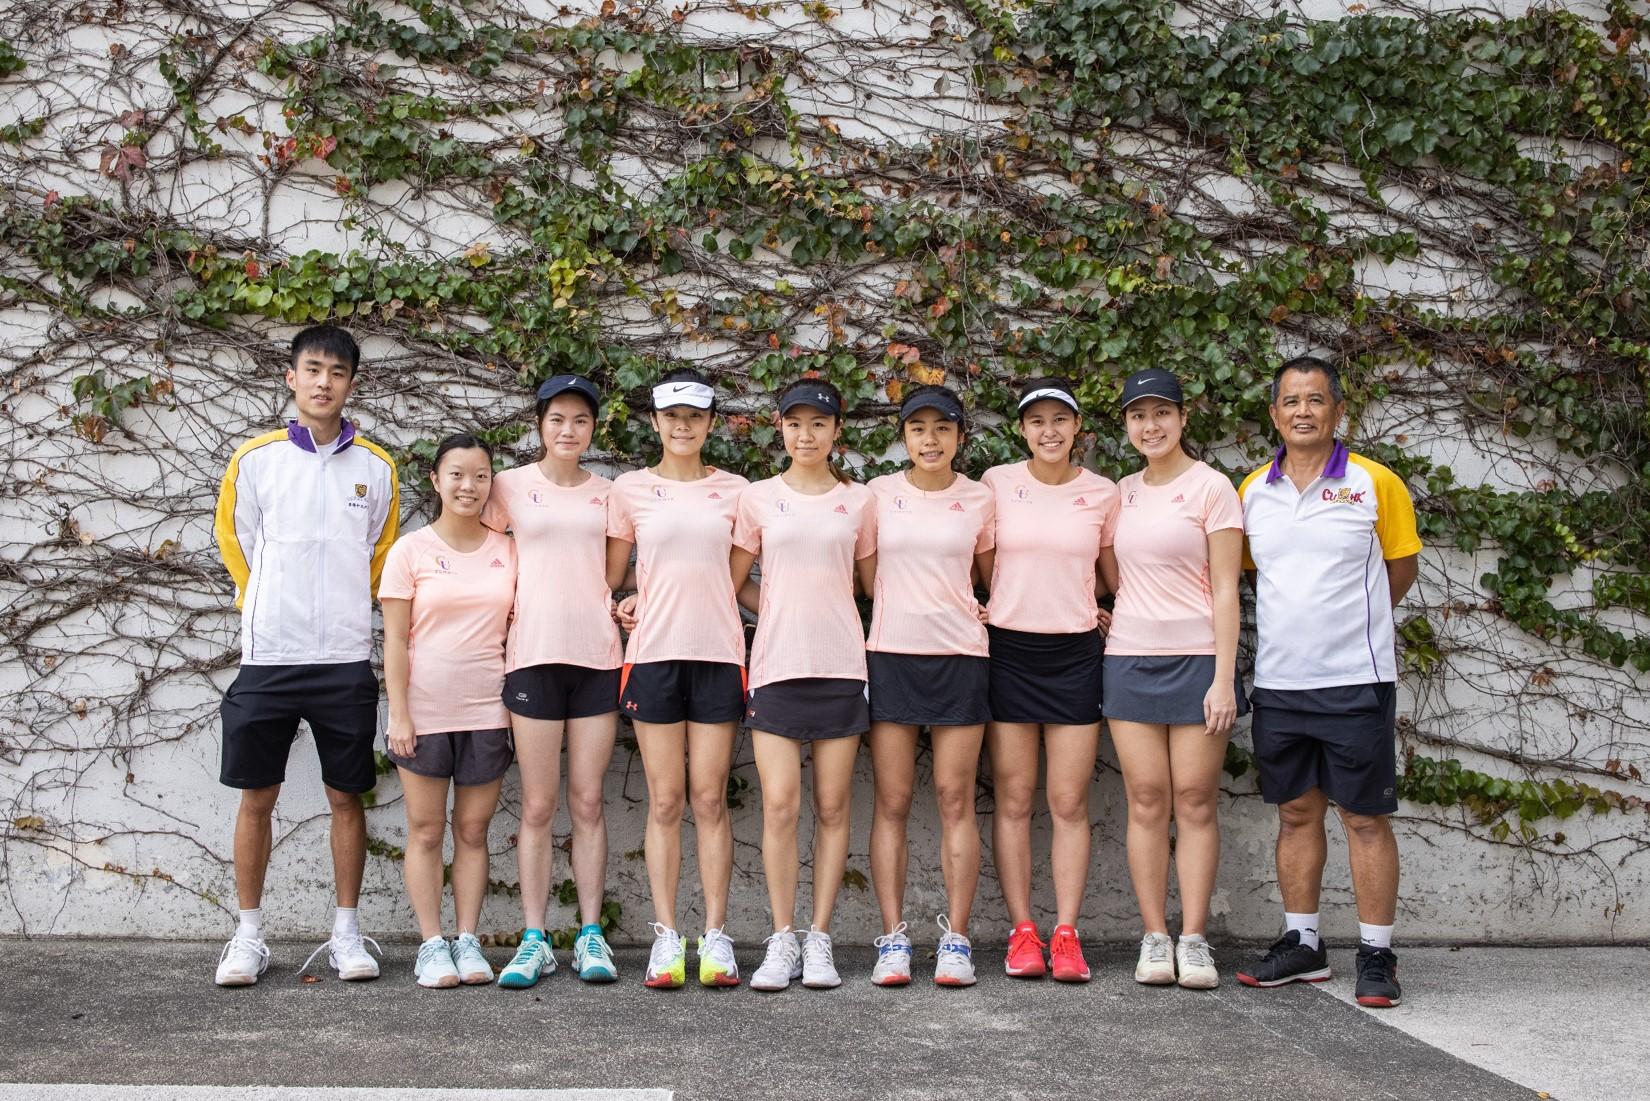 Tennis girls 2019 2020